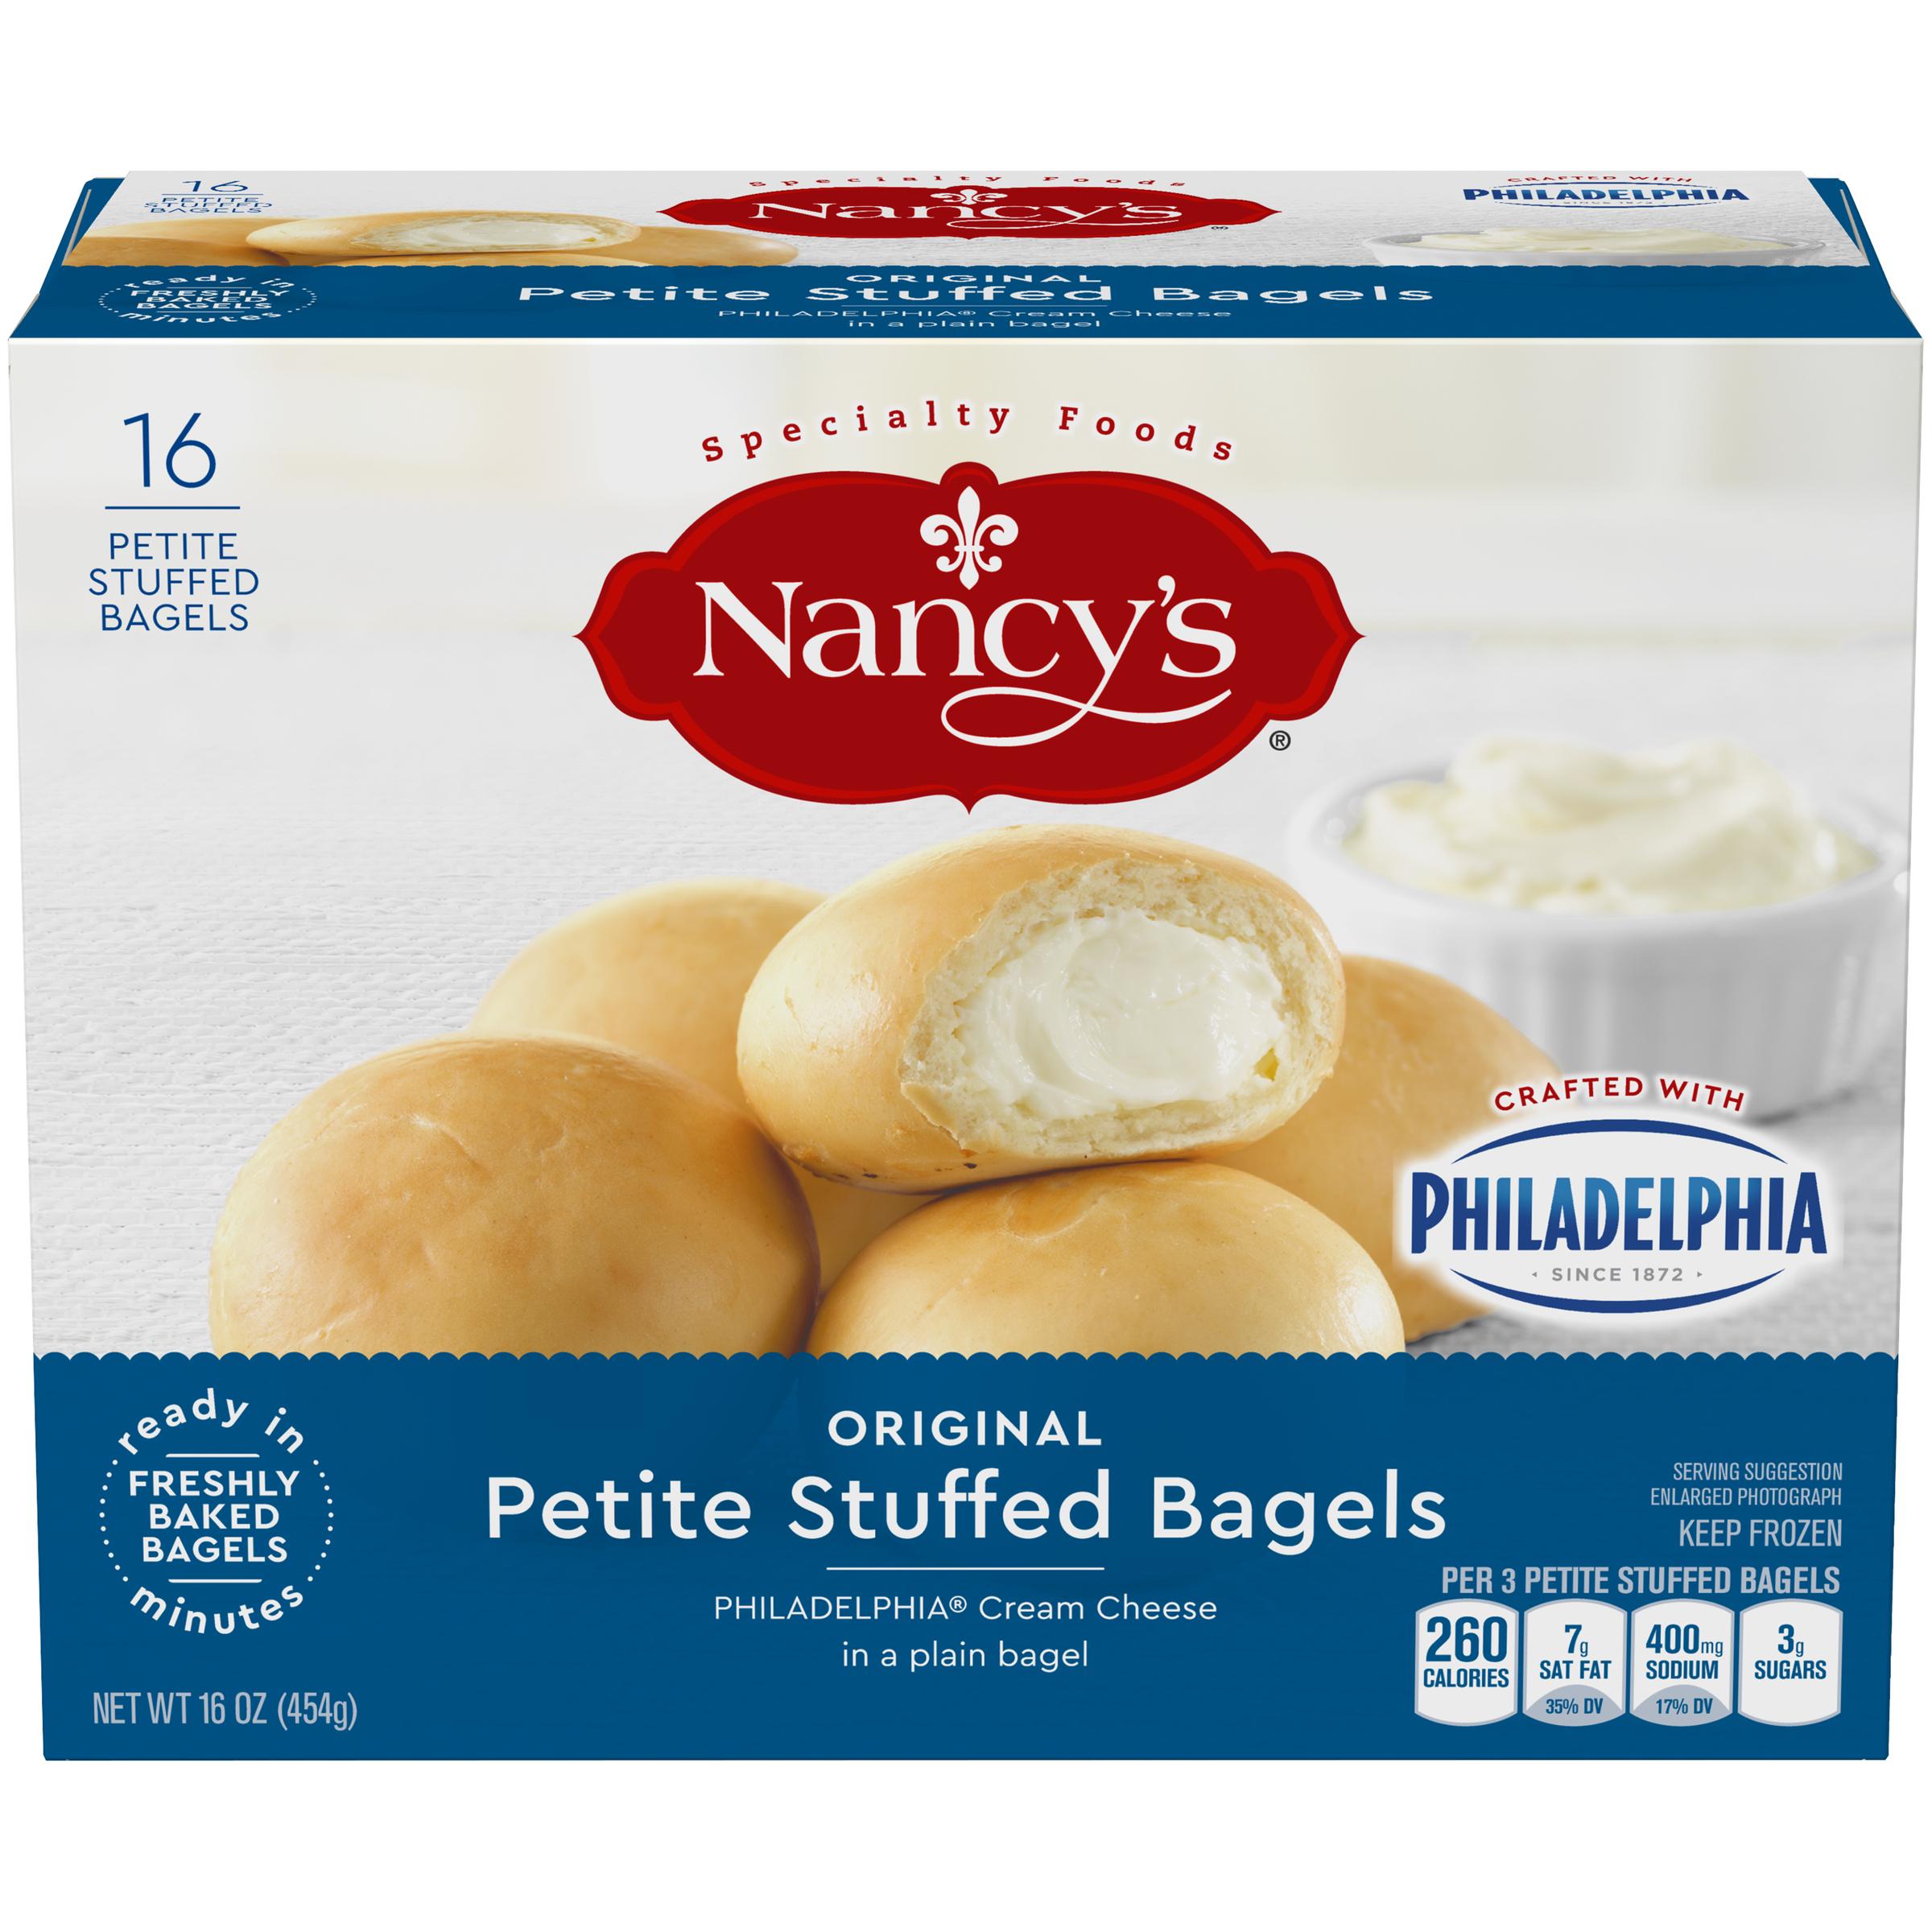 Nancy's Original Petite Stuffed Bagels